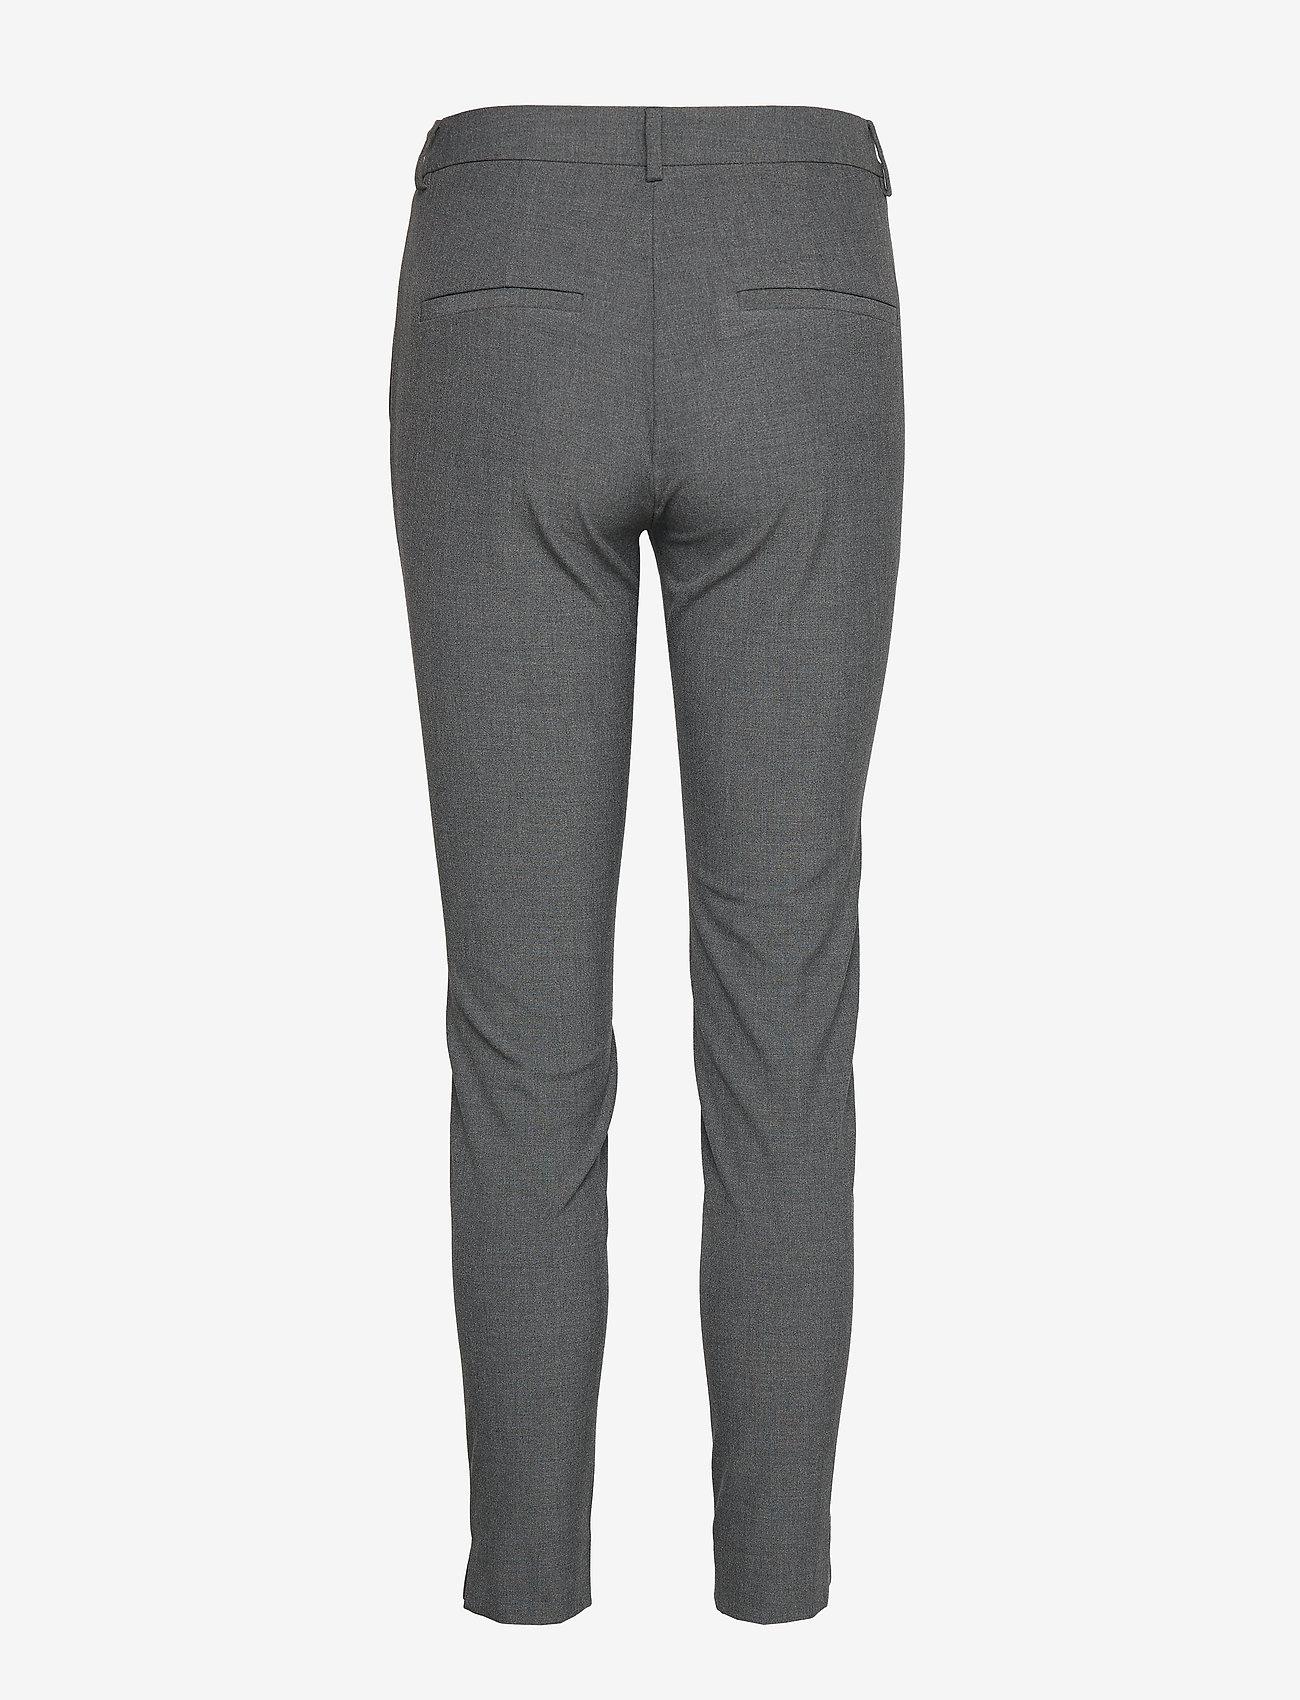 Selected Femme - SLFMUSE FIE CROPPED MW PANT MGM B NOOS - broeken med straight ben - medium grey melange - 1